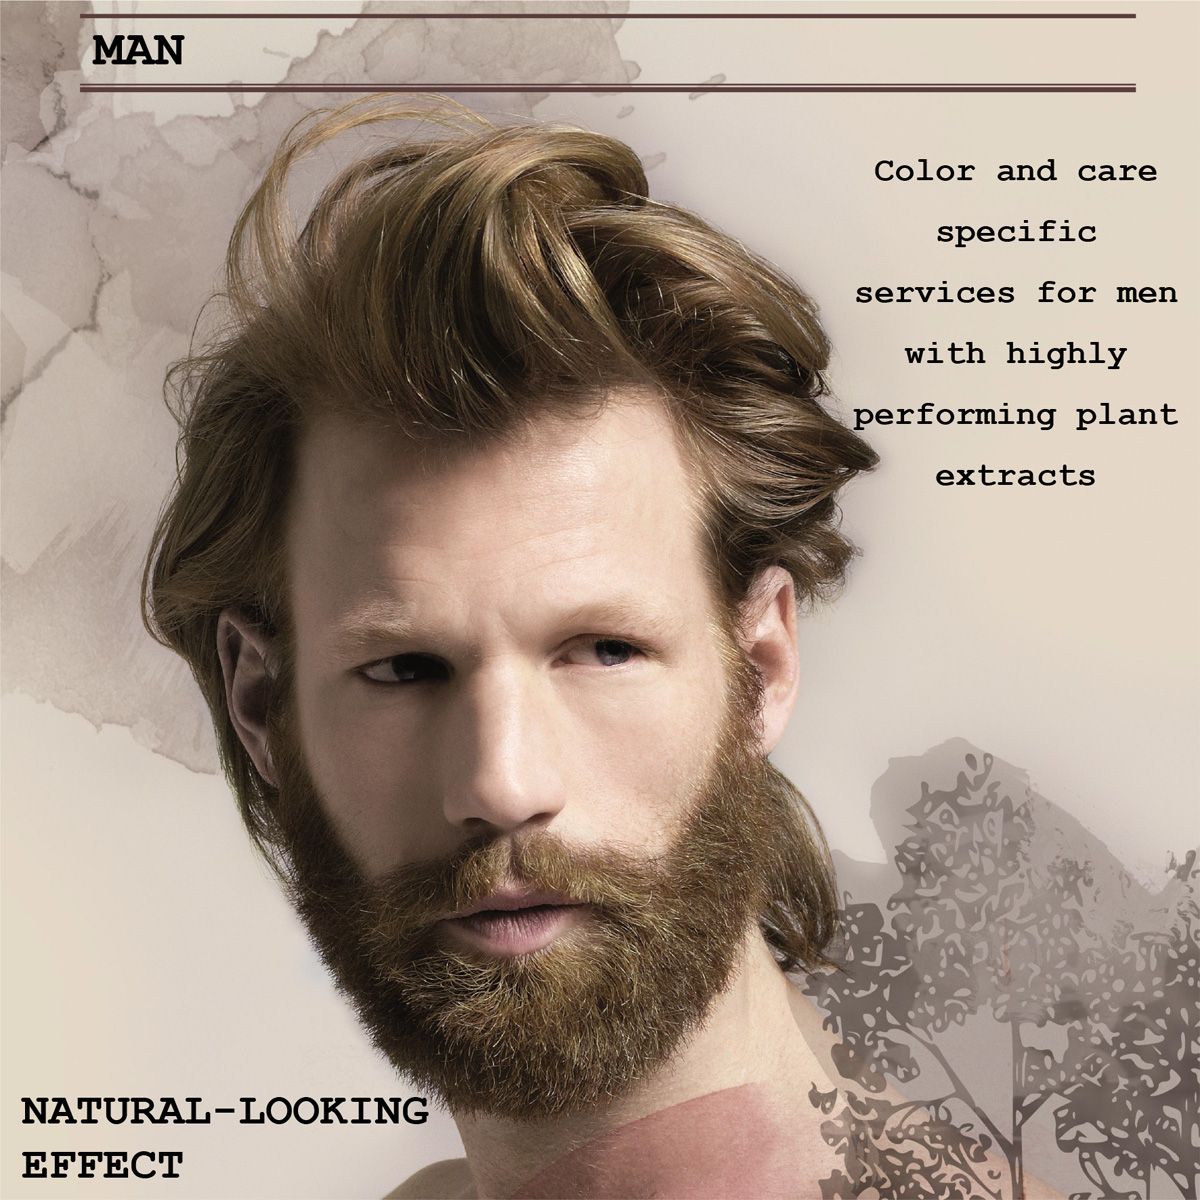 Elgon Man Presentation-4.jpg